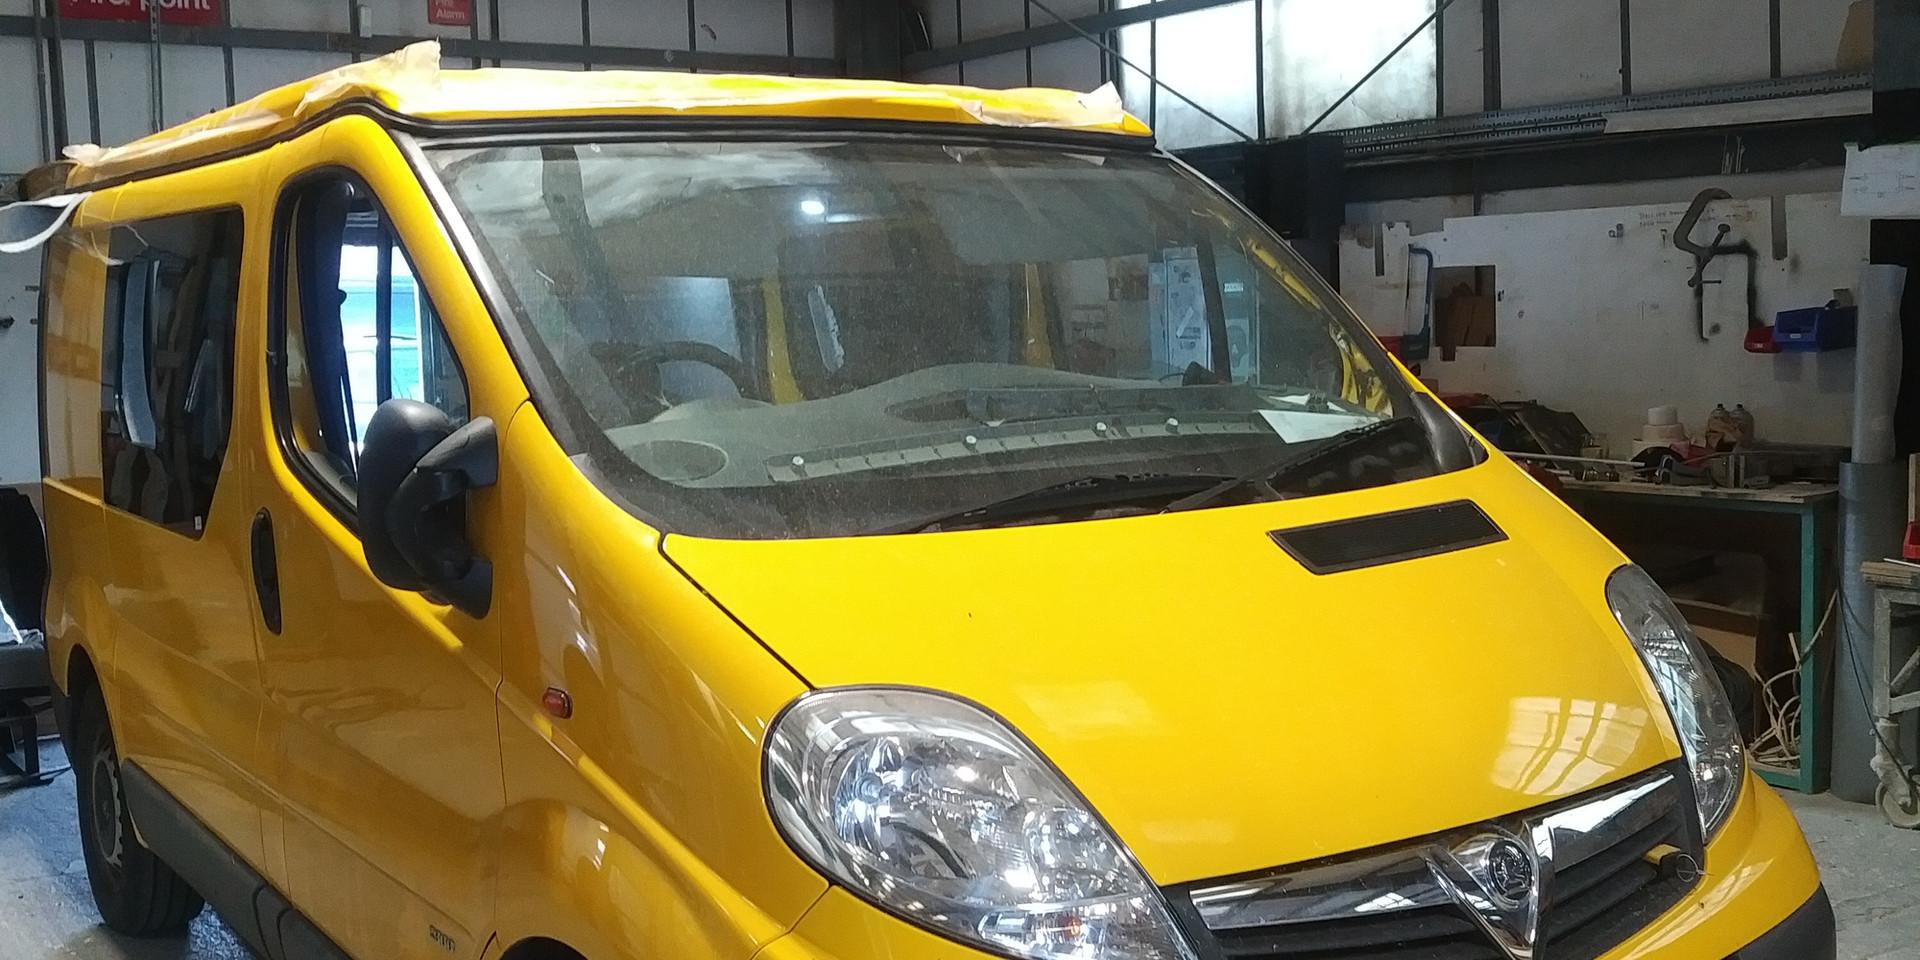 Vauxhall Vivaro - Bumble Bee-4.jpg